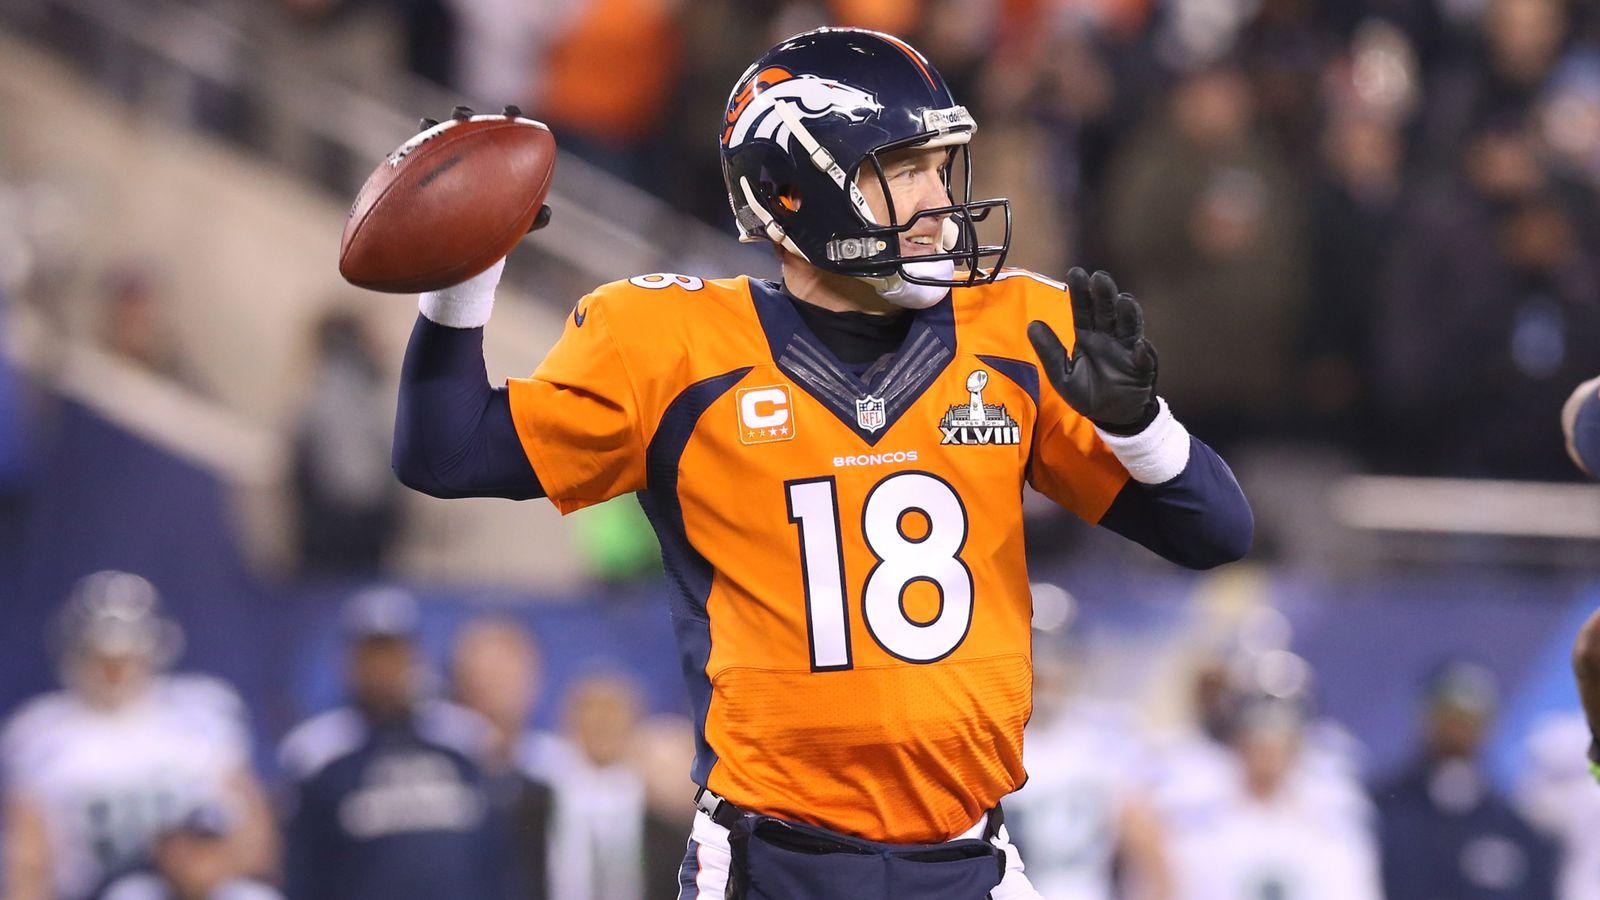 Rumor: Broncos uniform change in the works